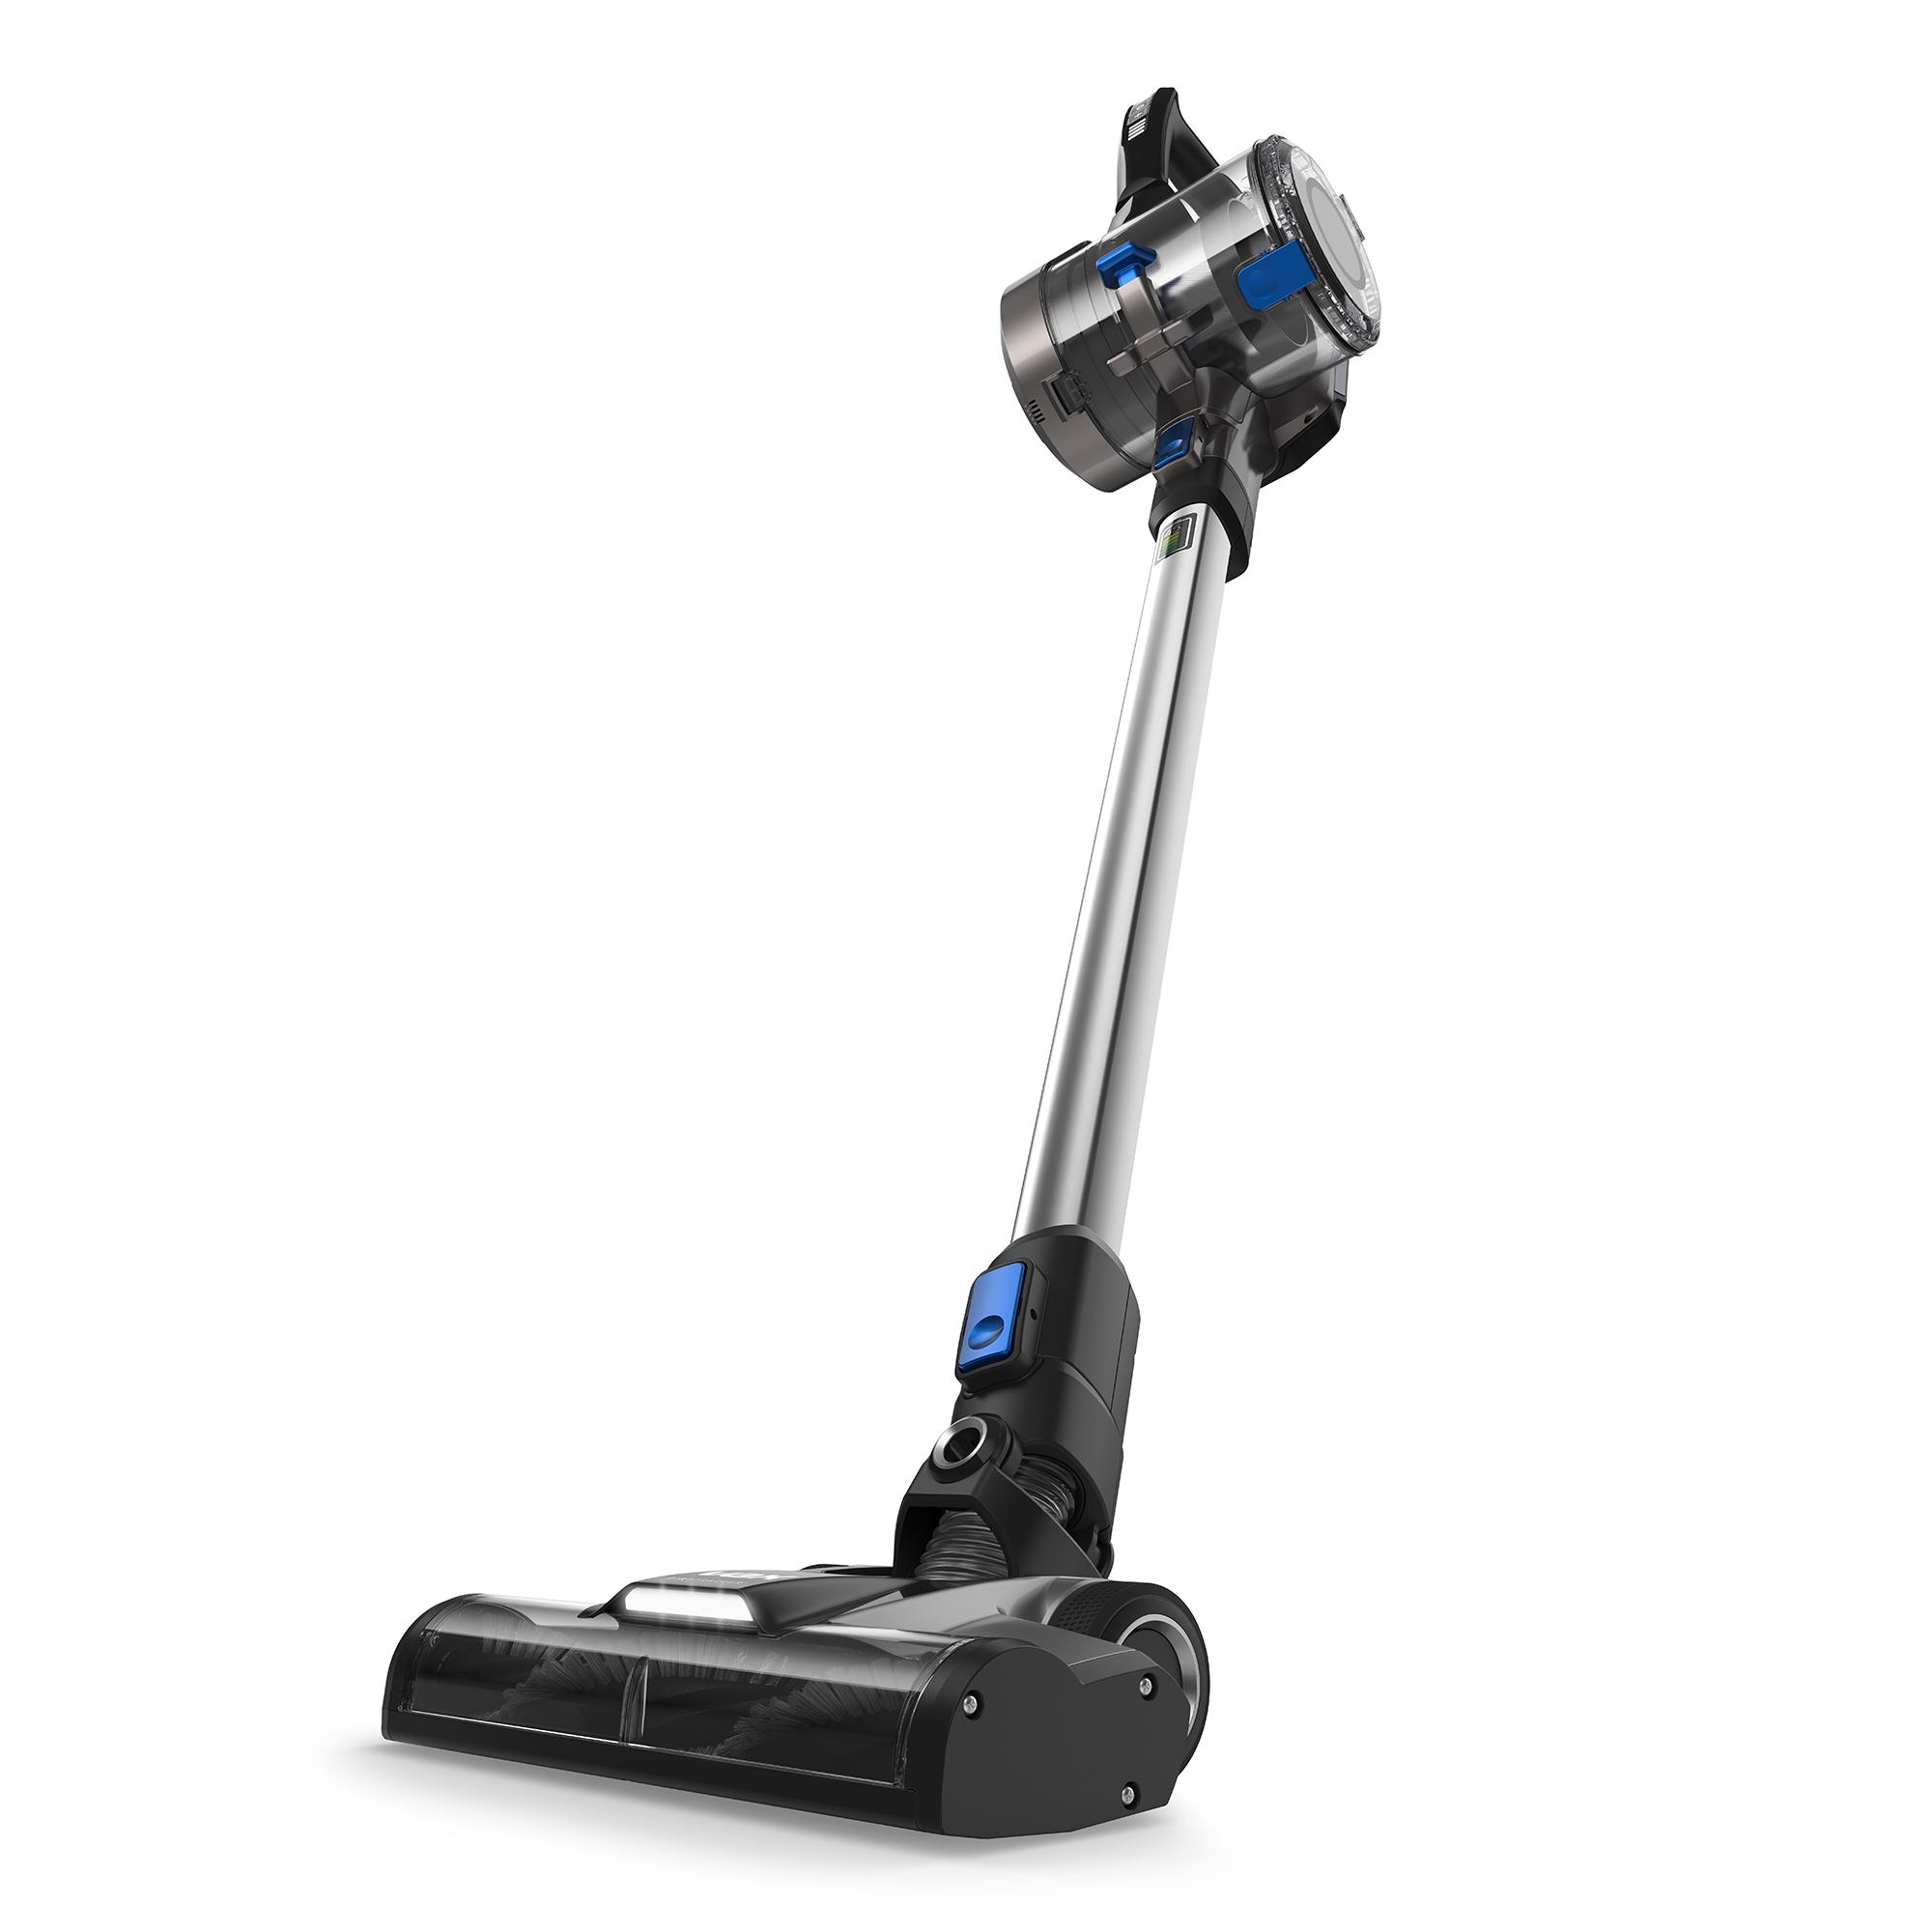 Details about Vax Blade 2 Cordless Vacuum Cleaner 32V 0.6L 4 Hour VBB2ASV1RA Refurbished (A)